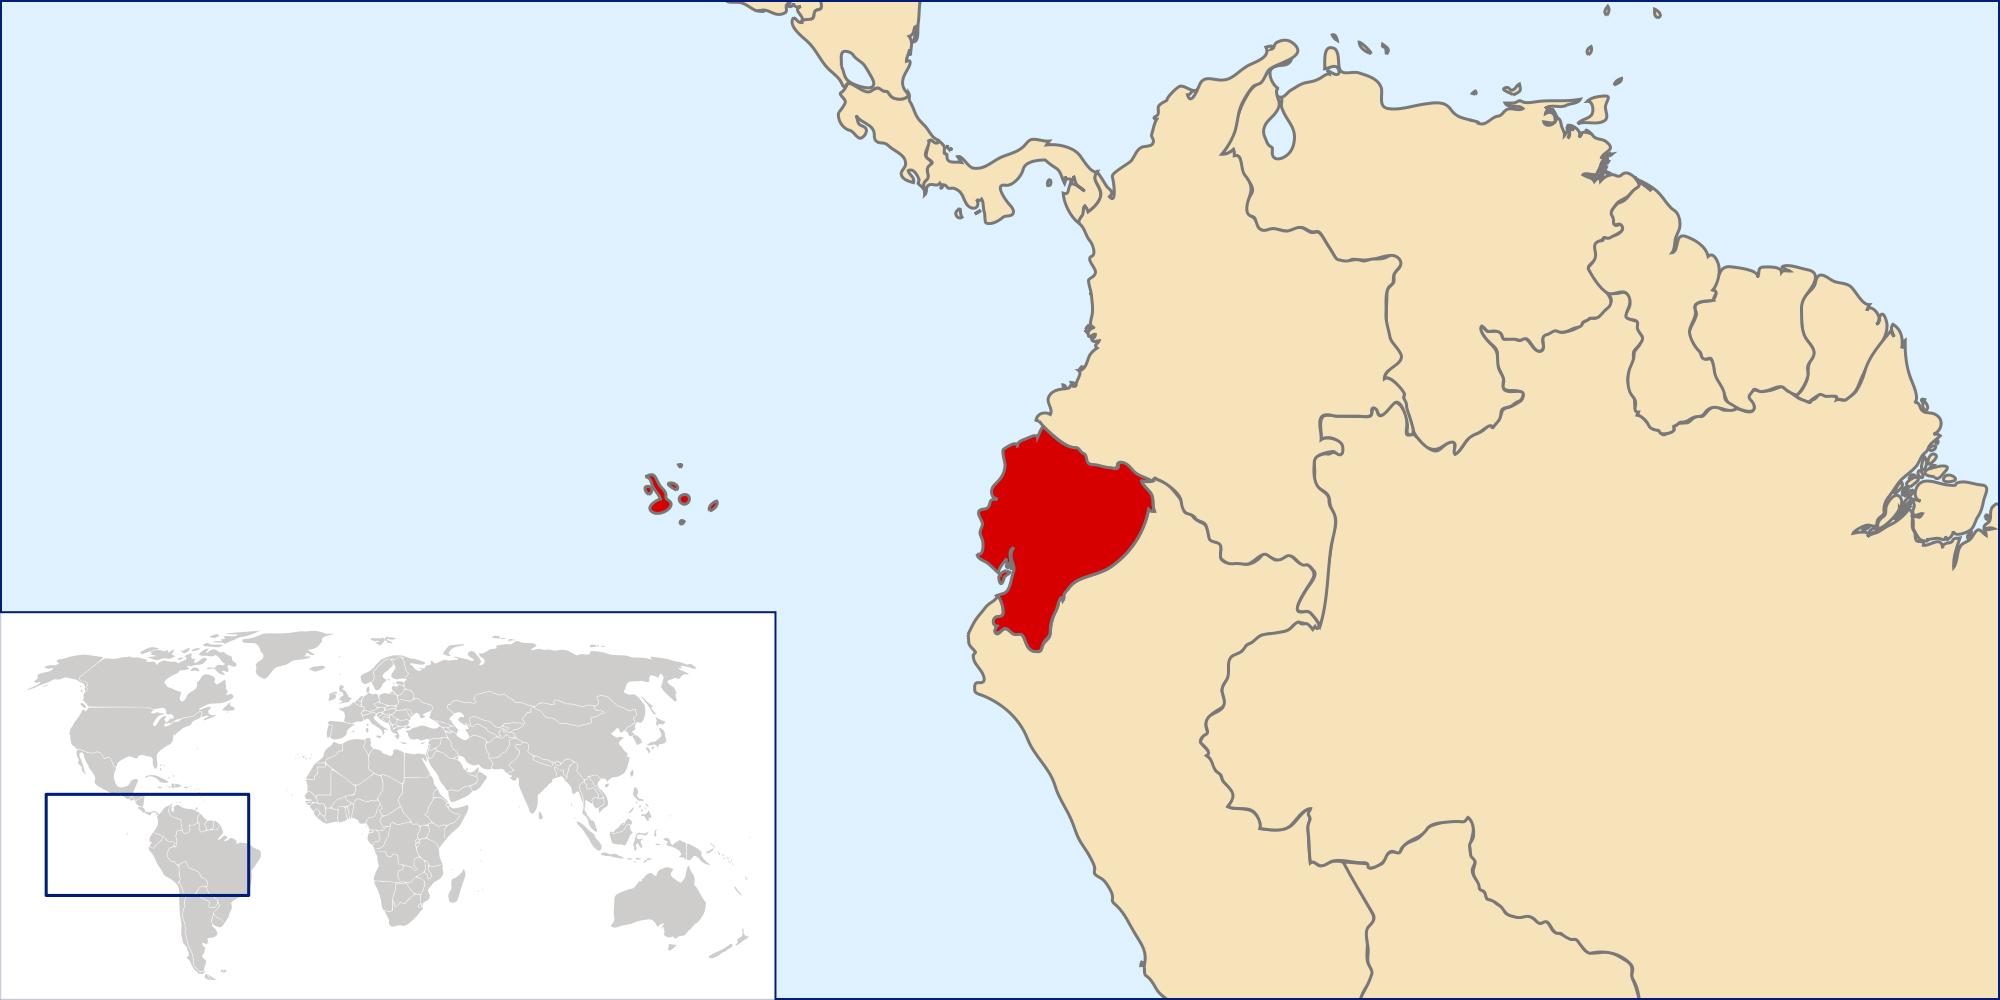 image of ecuador (http://www.vidiani.com/maps/maps_of_south_america/maps_of_ecuador/ecuador_location_map.jpg)